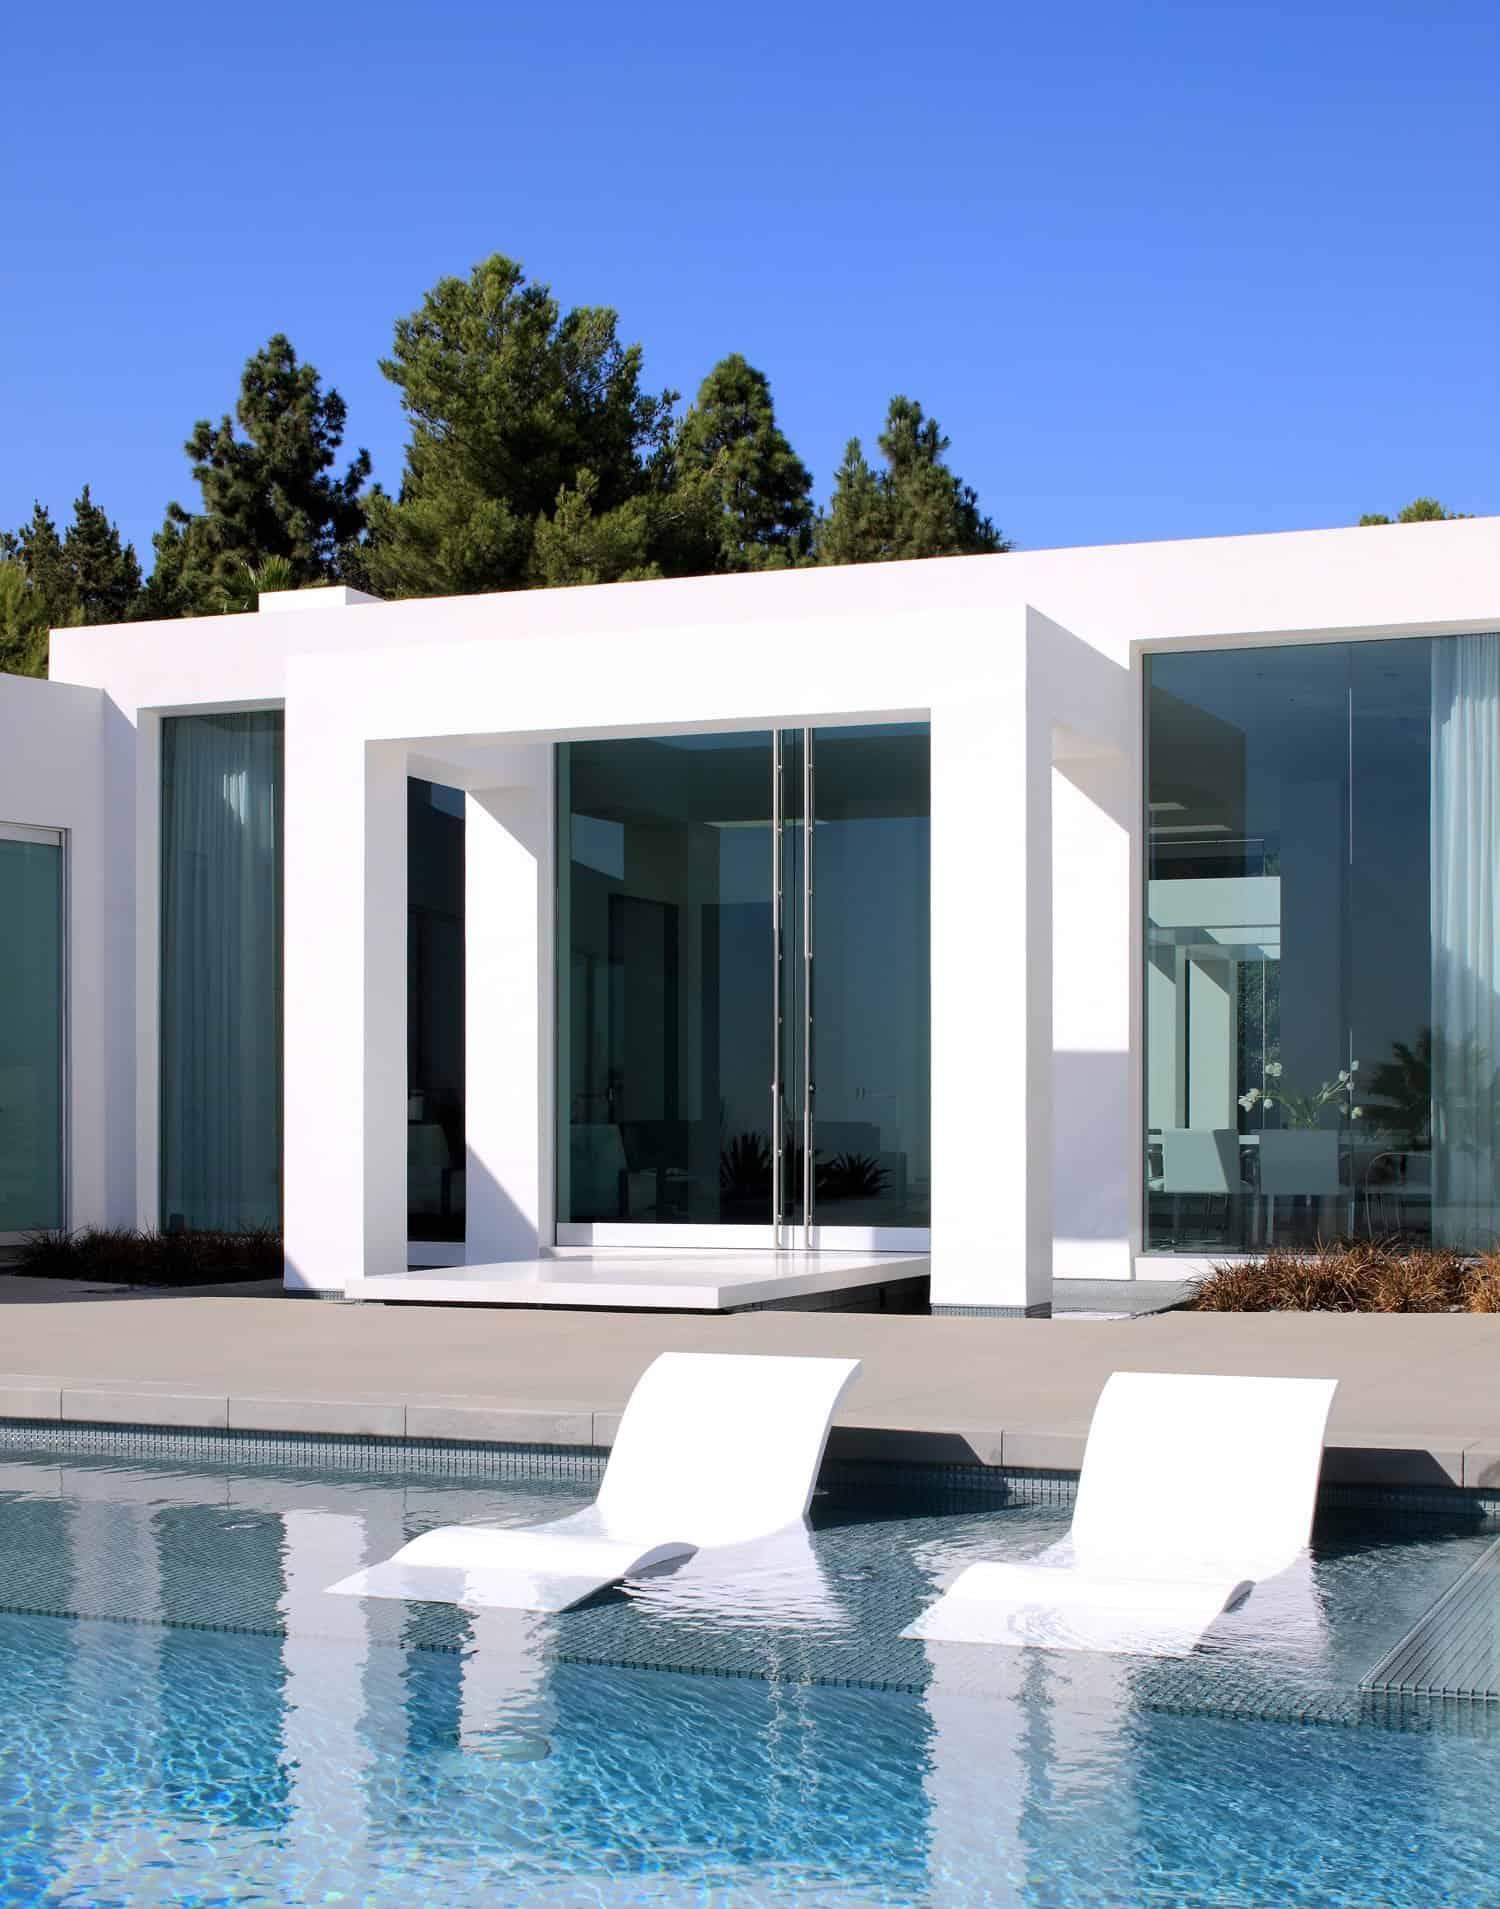 Modern-Residence-Architecture-Magni Design-03-1 Kindesign